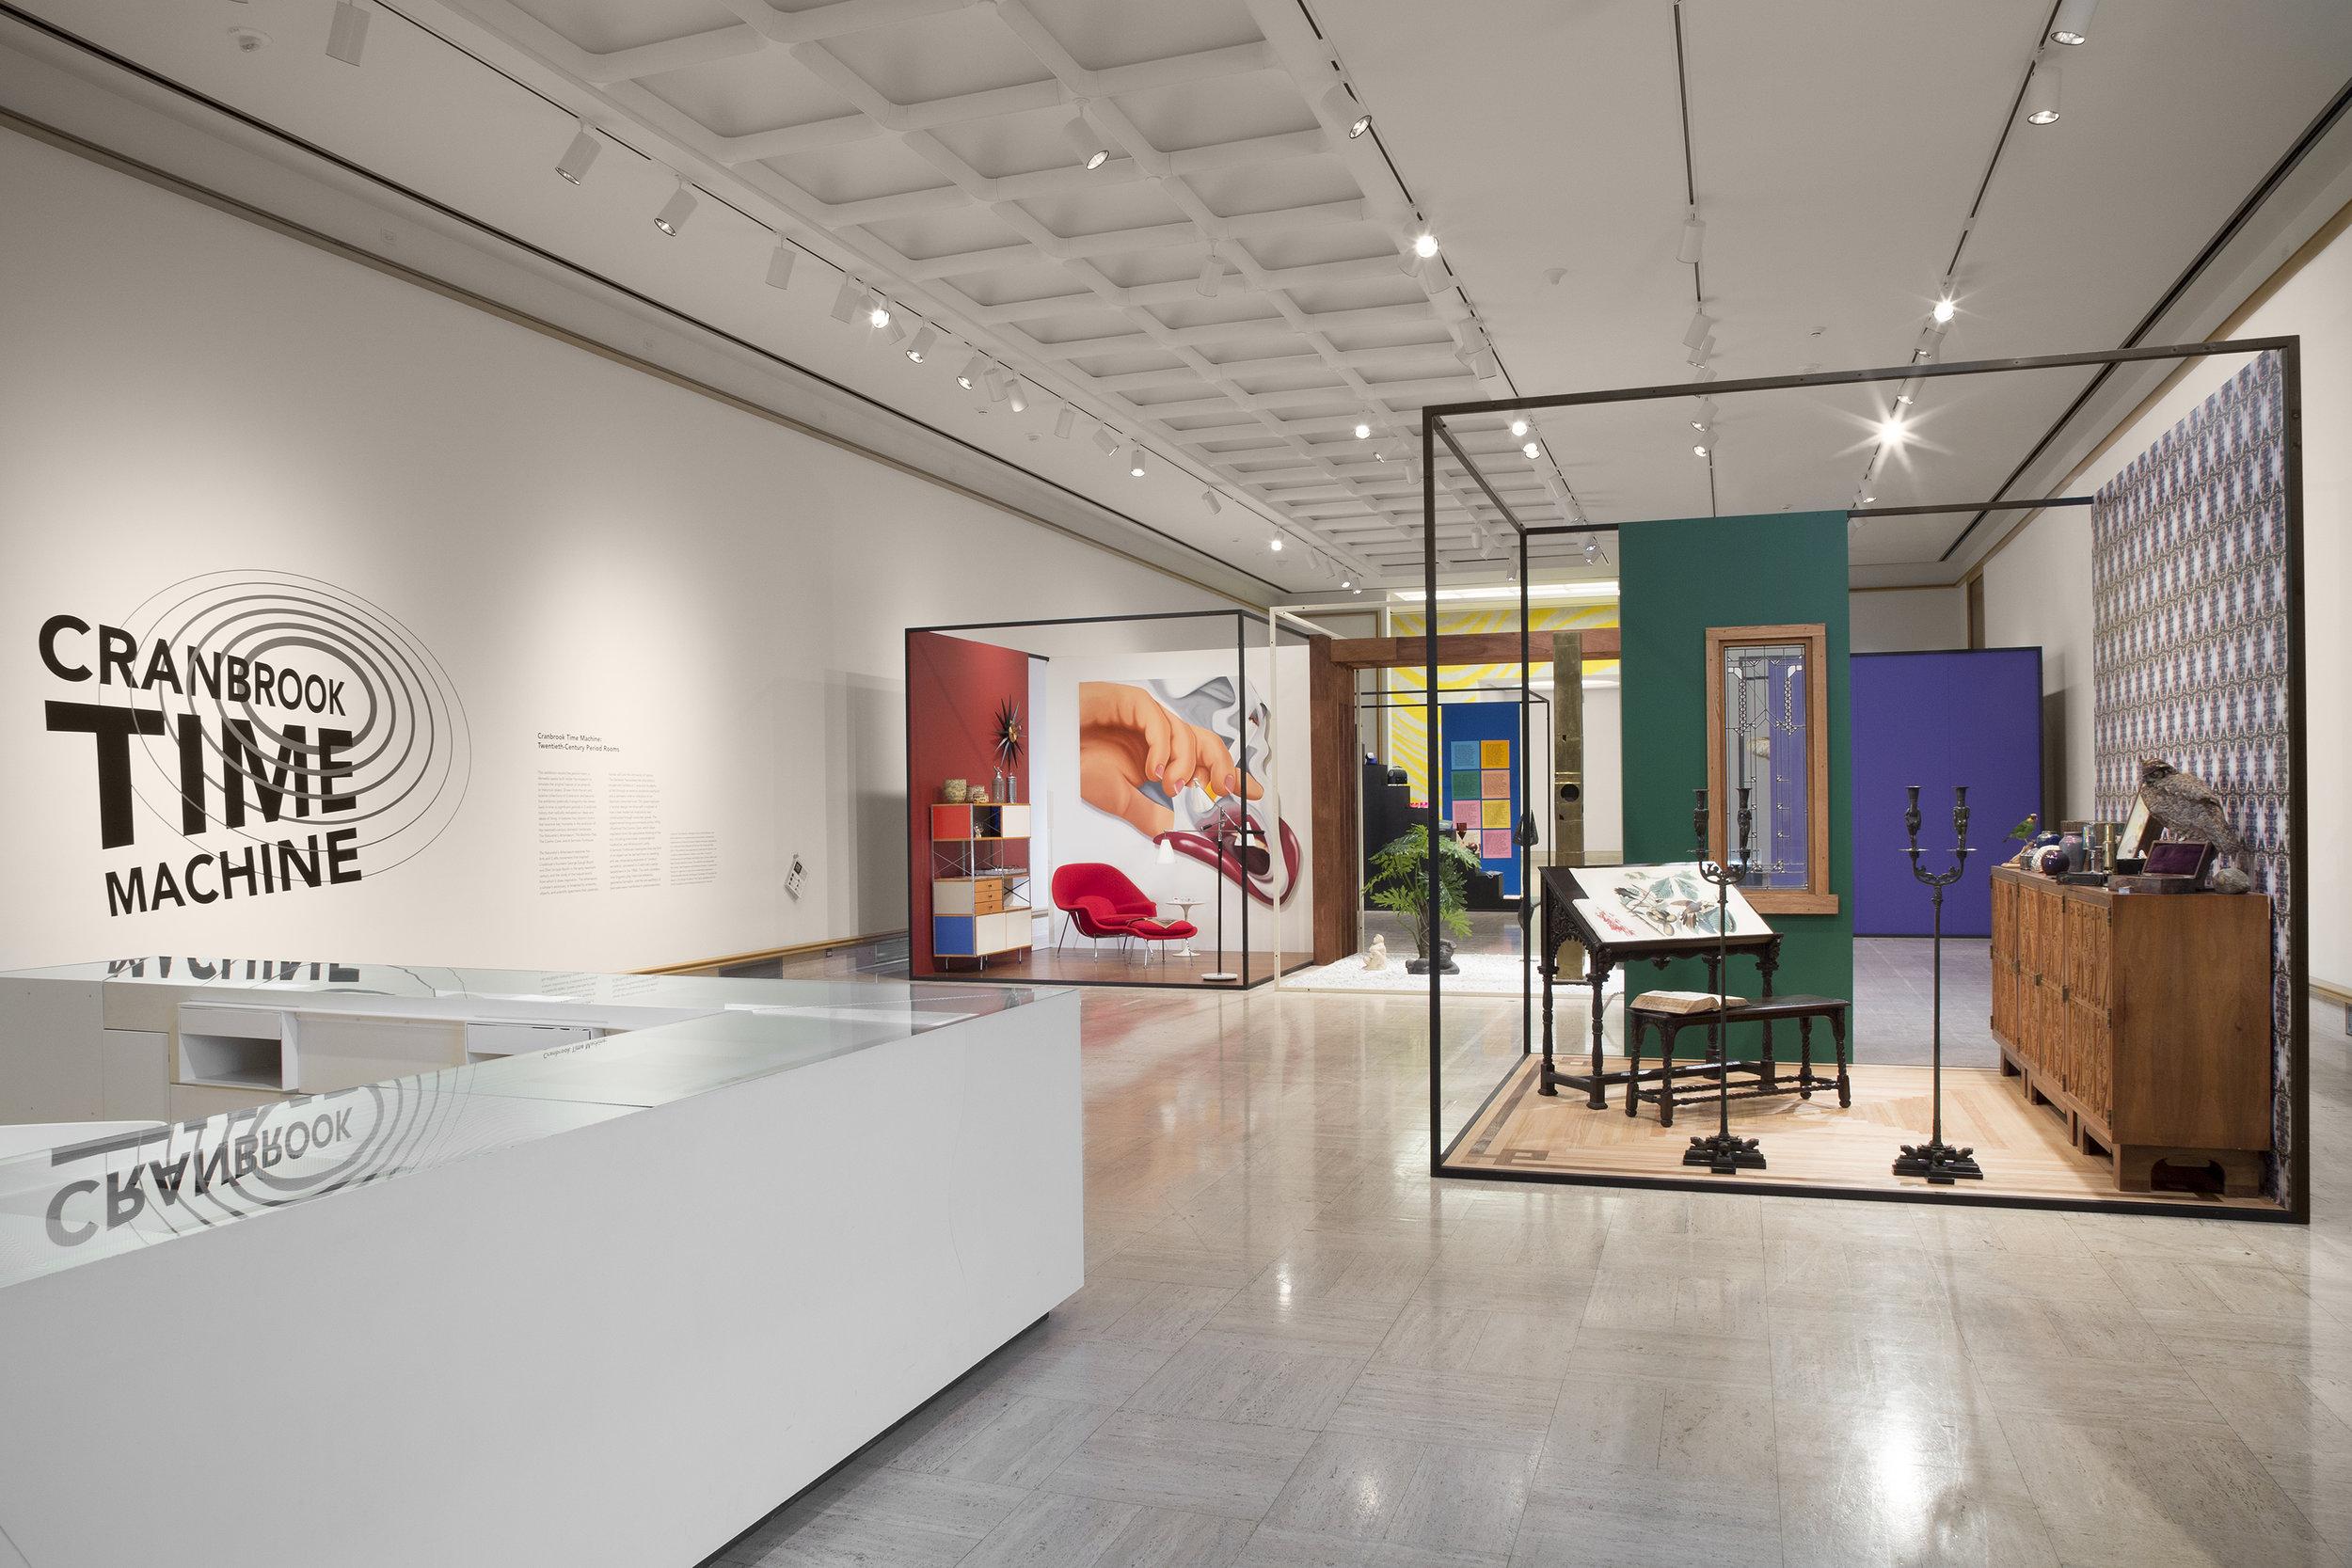 CRANBROOK TIME MACHINE: 20TH CENTURY PERIOD ROOMS    Cranbrook Art Museum   November 2016 - March 2017   Photo: PD Rearick